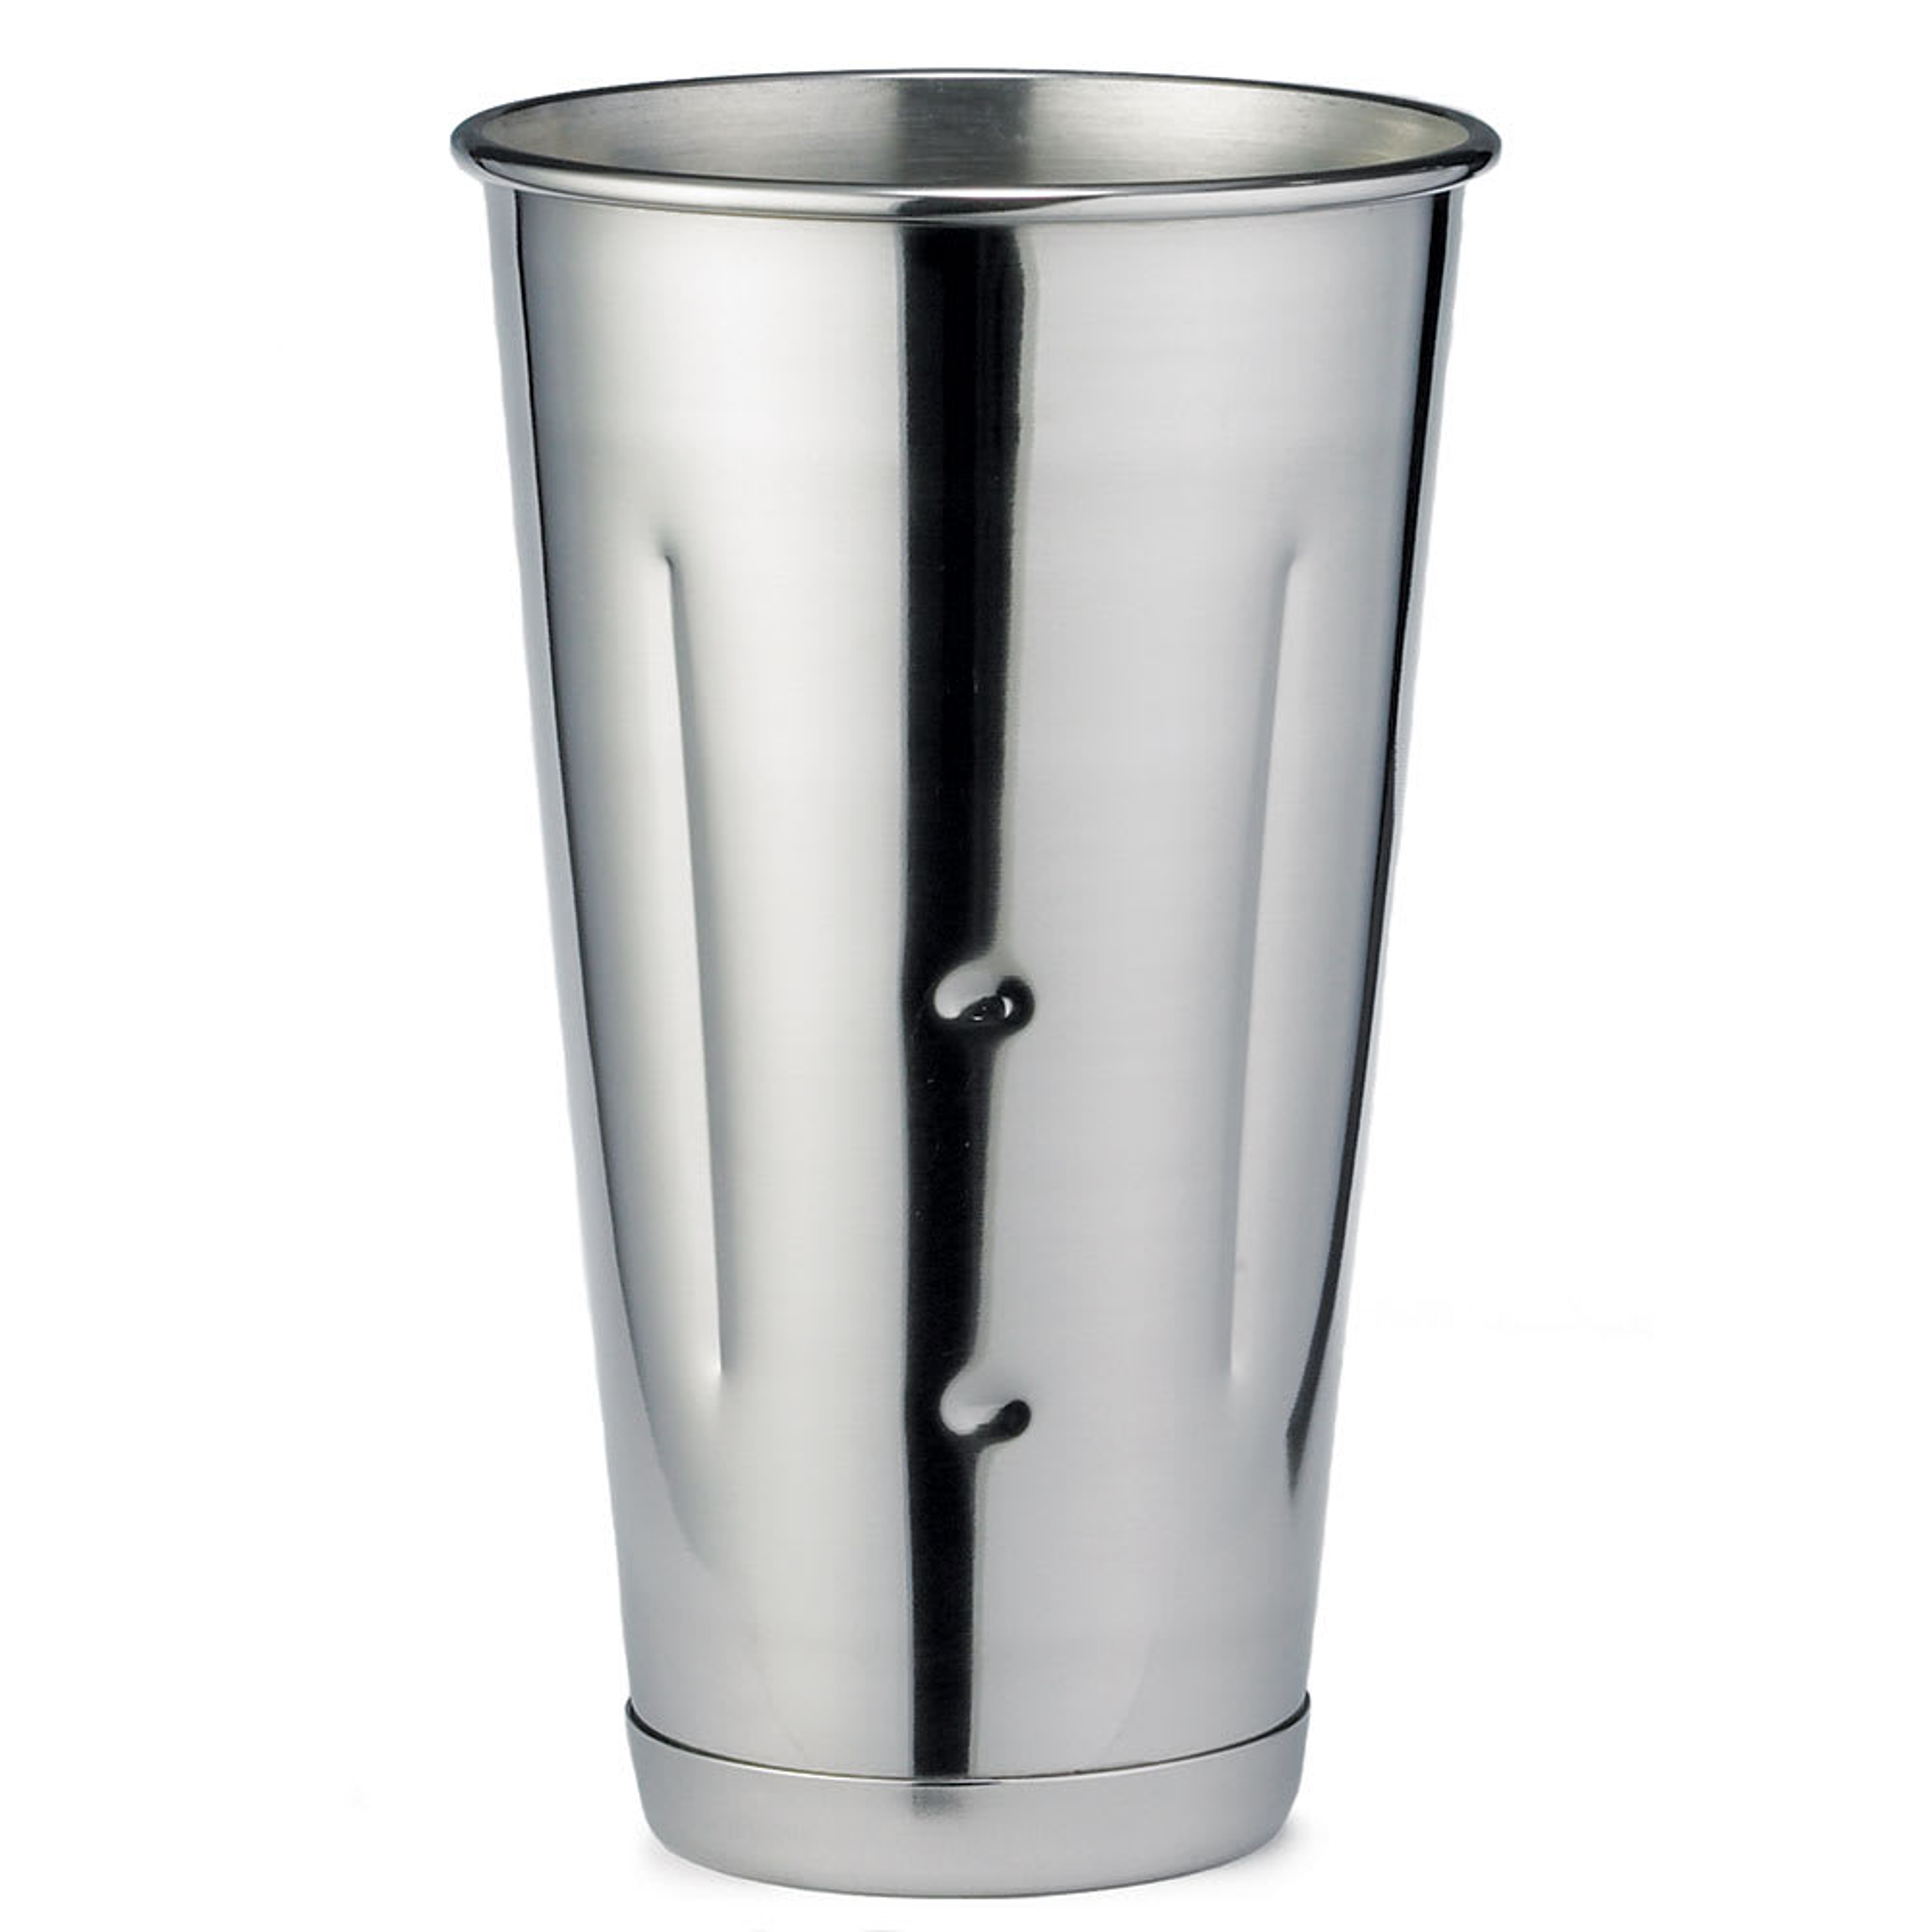 Tablecraft 64E 30 oz Stainless Steel Malt Cup